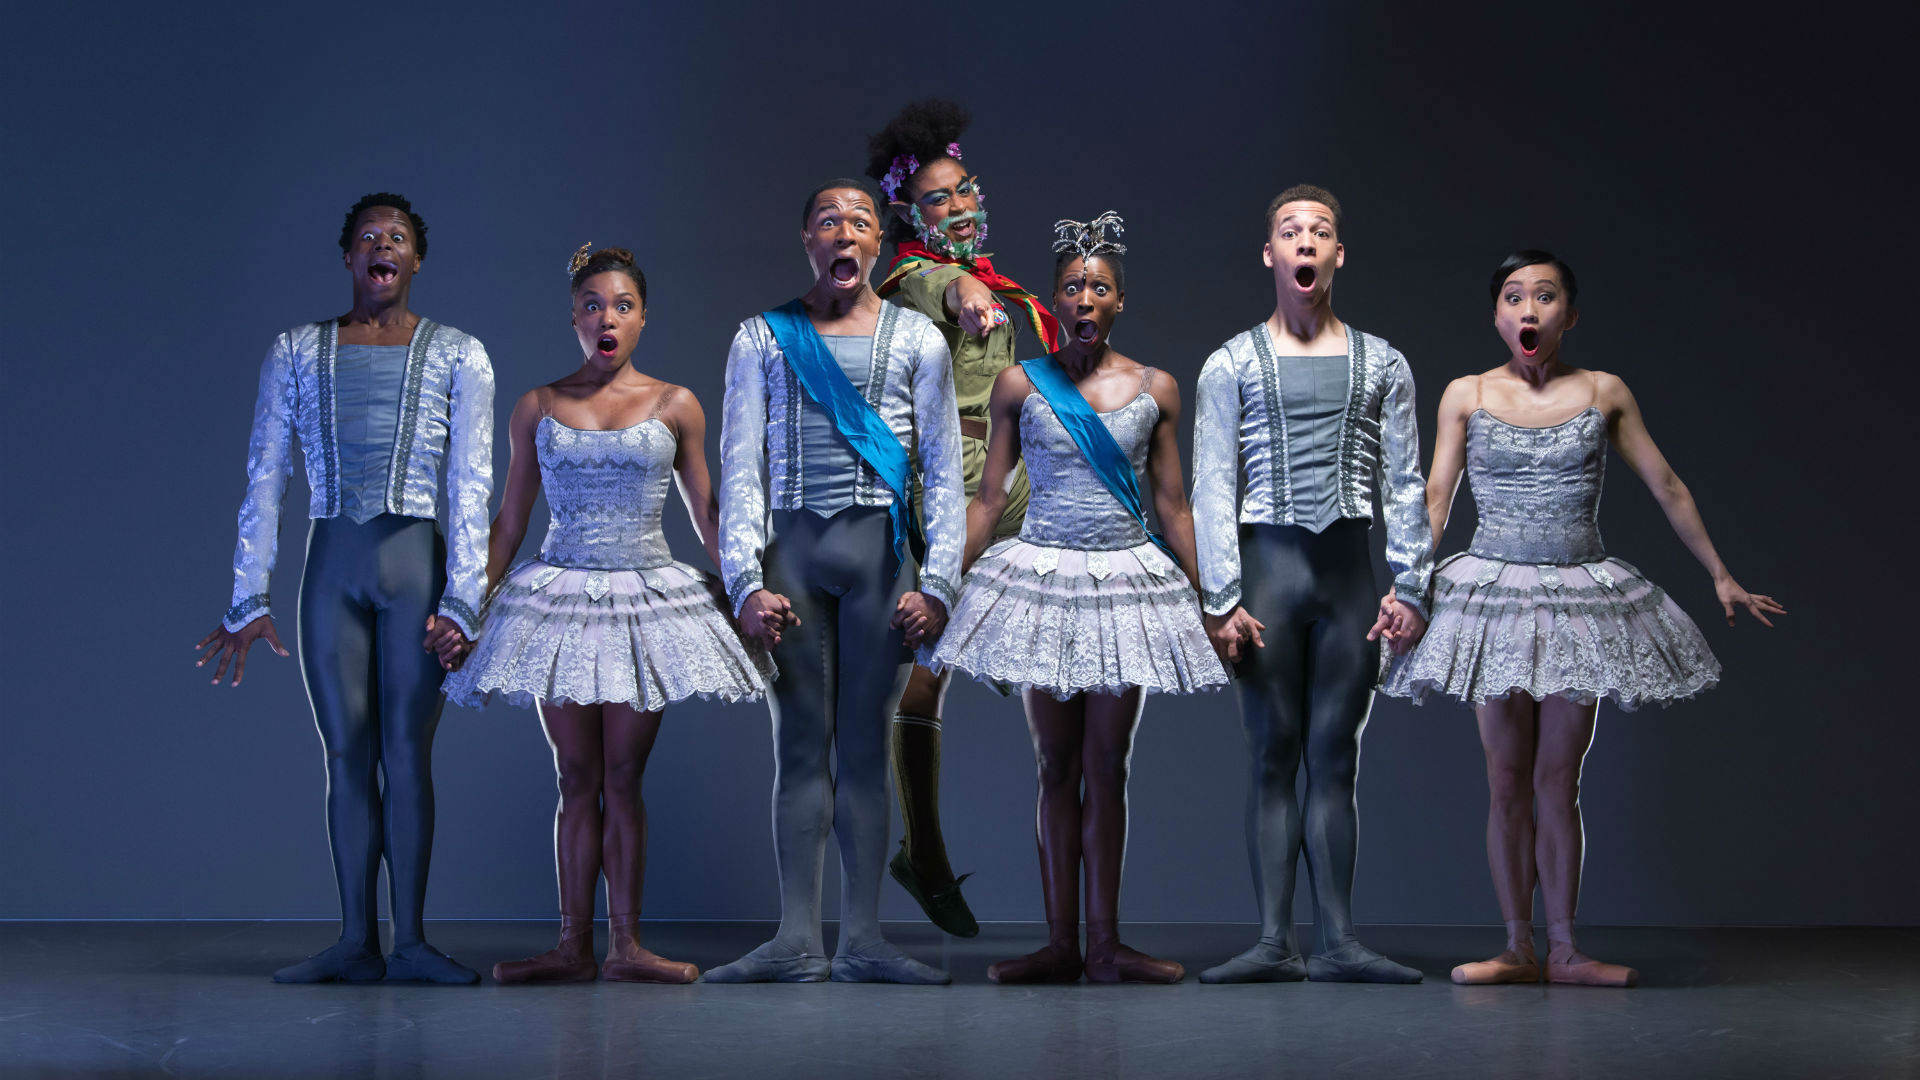 ballet-black-pic